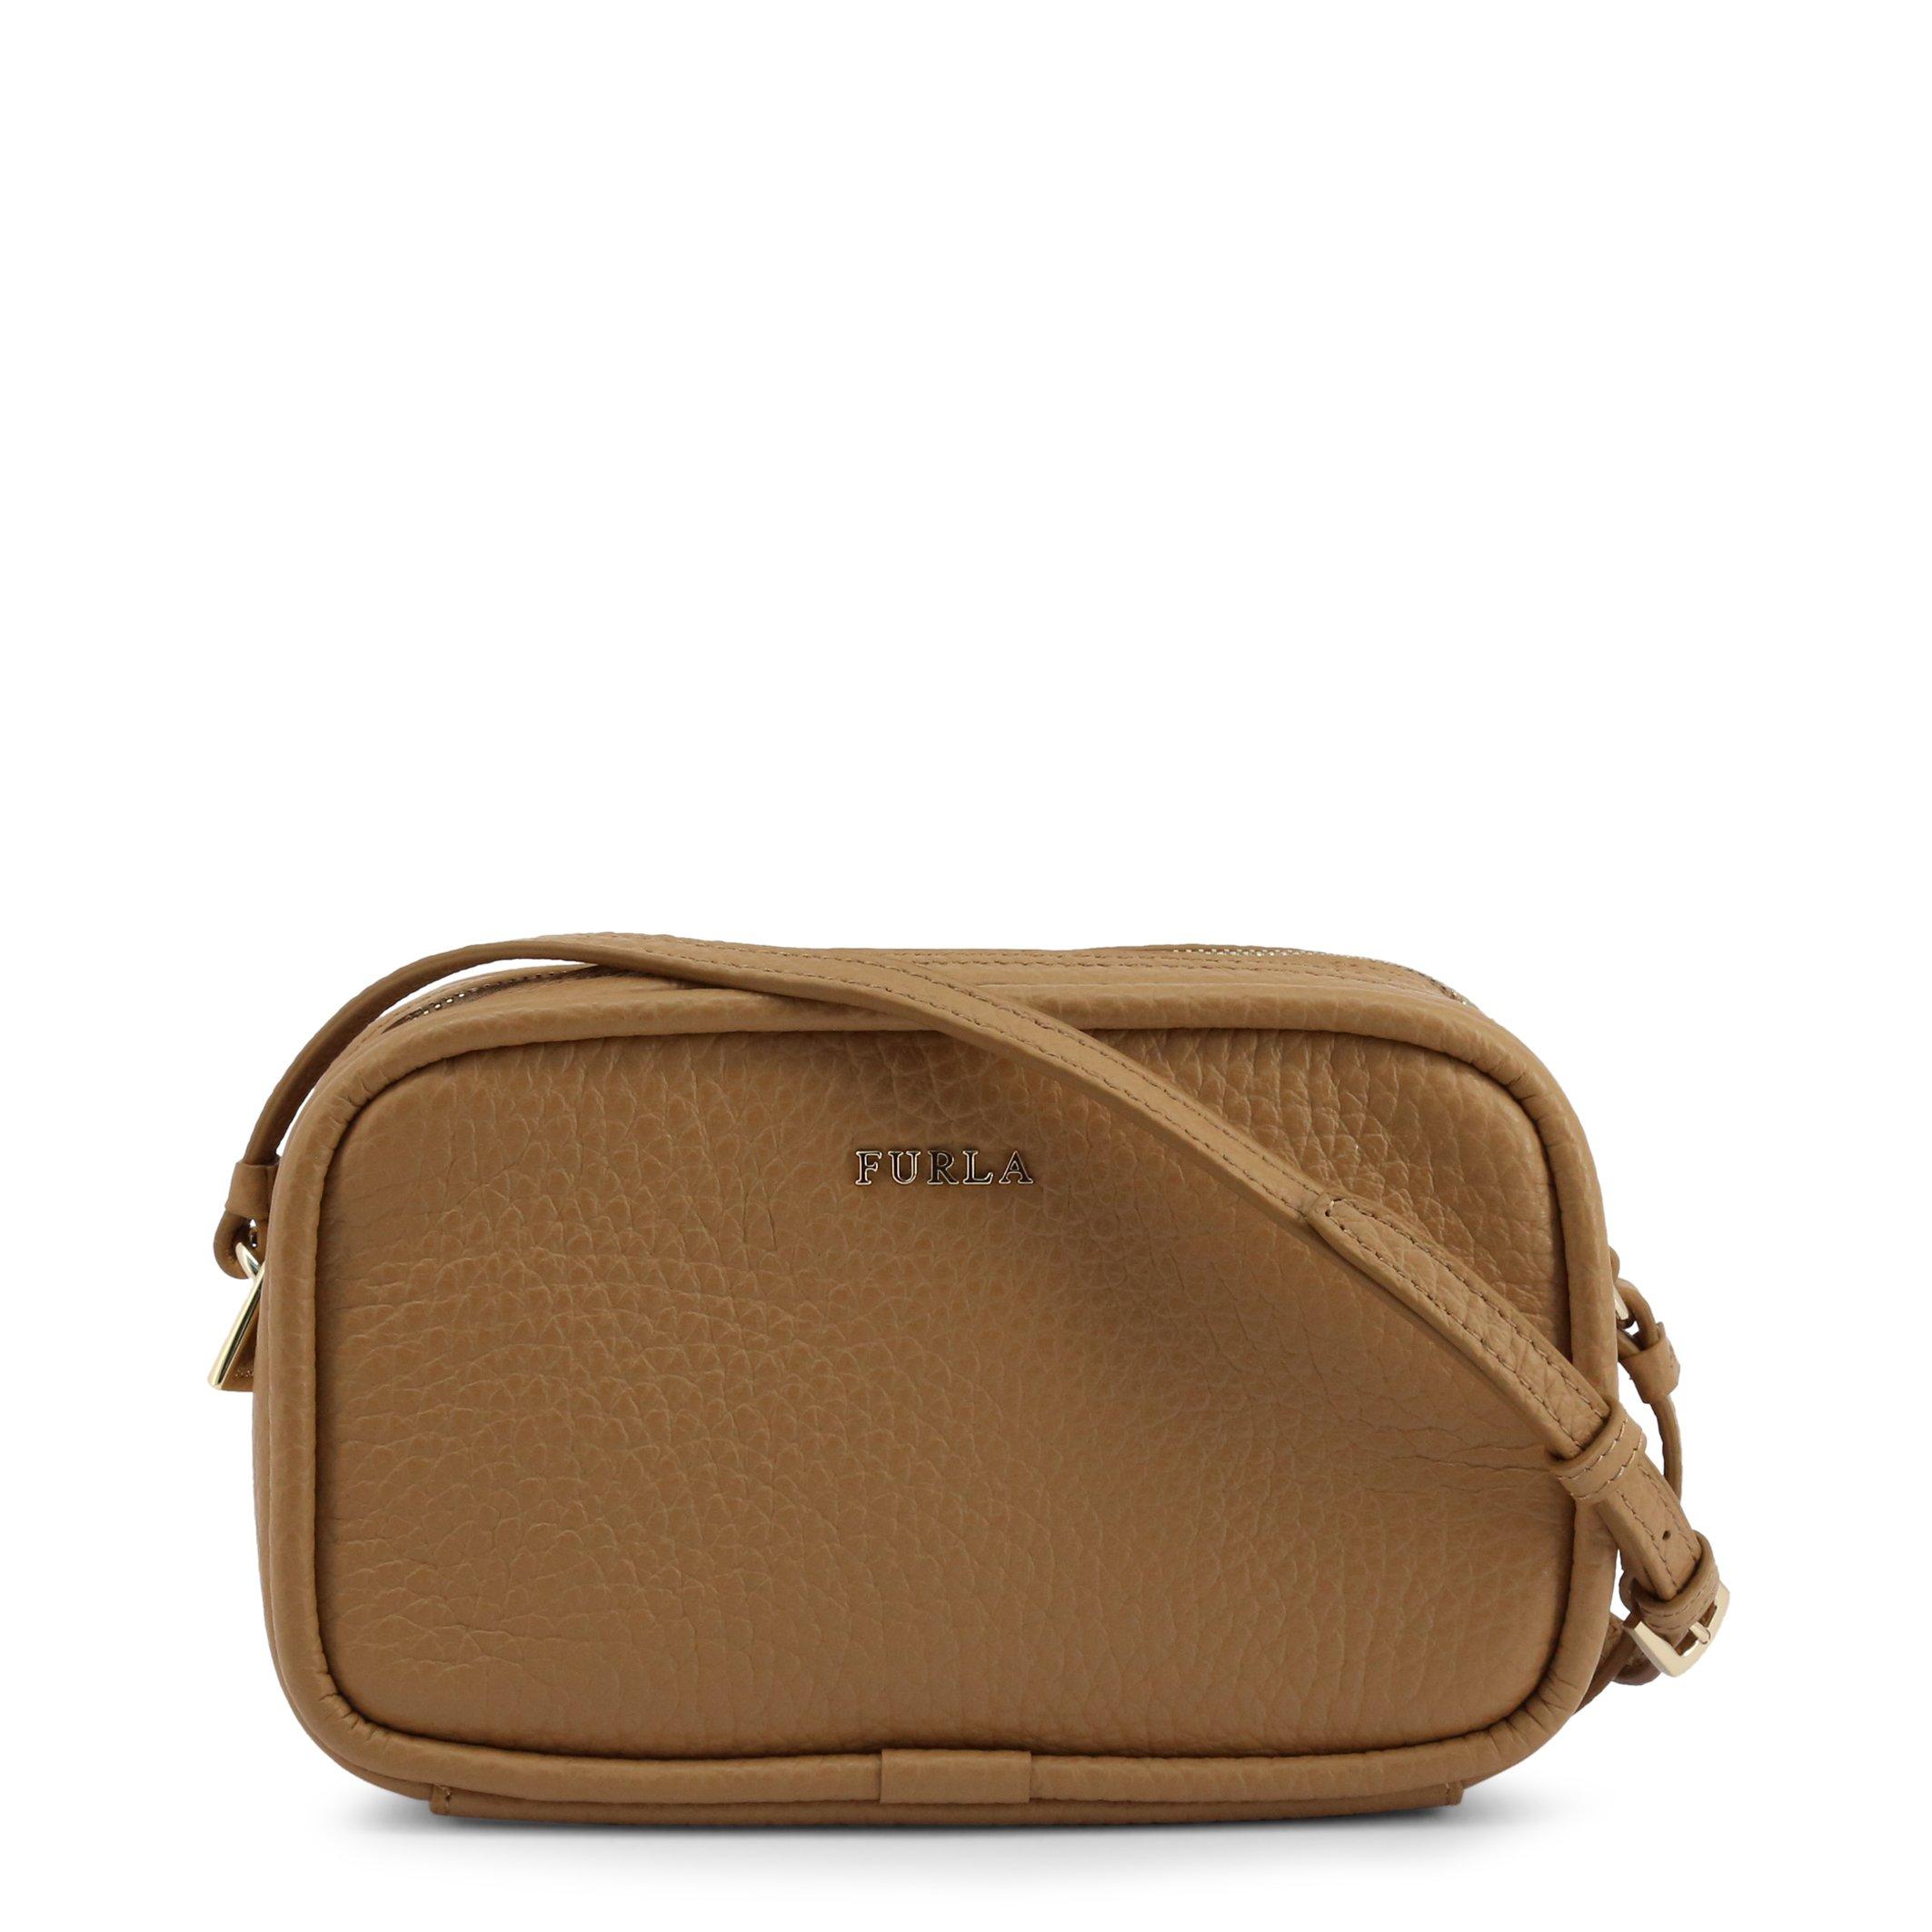 Furla Women's Crossbody Bag Various Colours LILLI_EAX8 - brown-1 NOSIZE